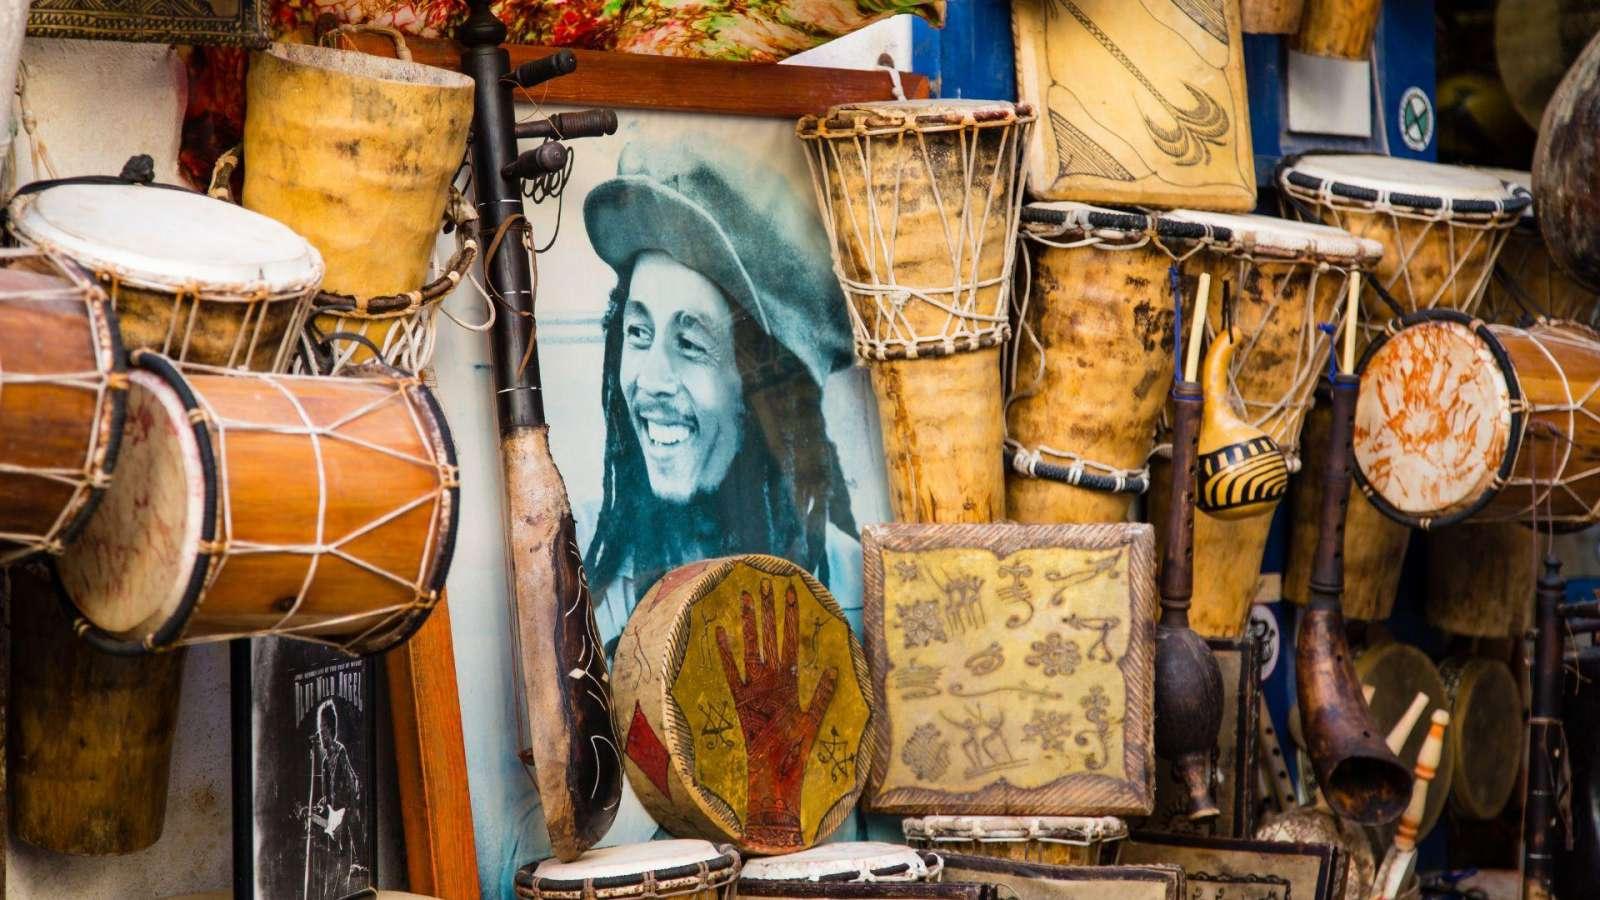 Muzikos legenda - Bob Marley